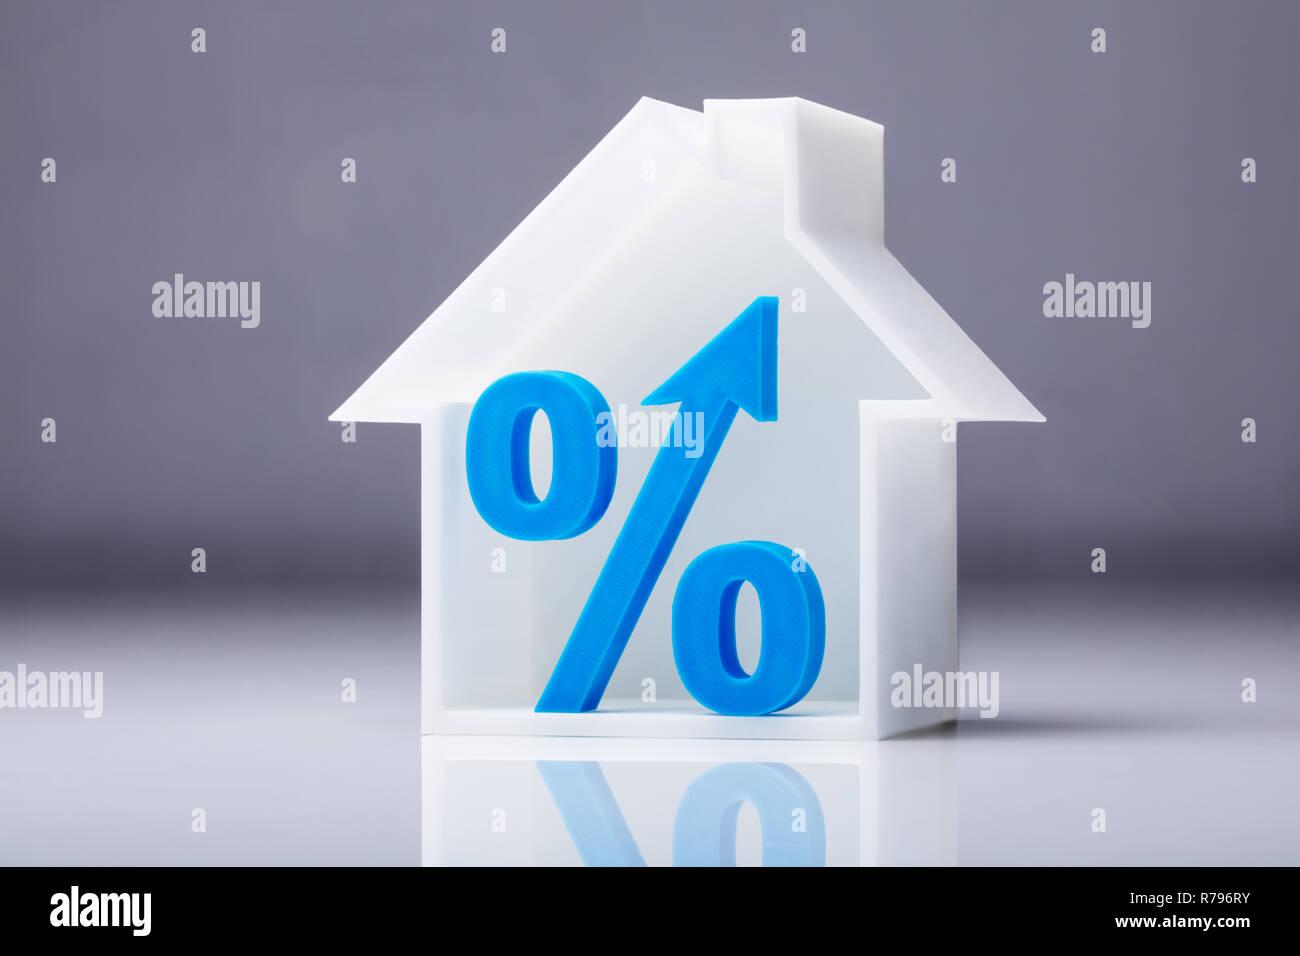 Percentage Symbol Inside House Model - Stock Image